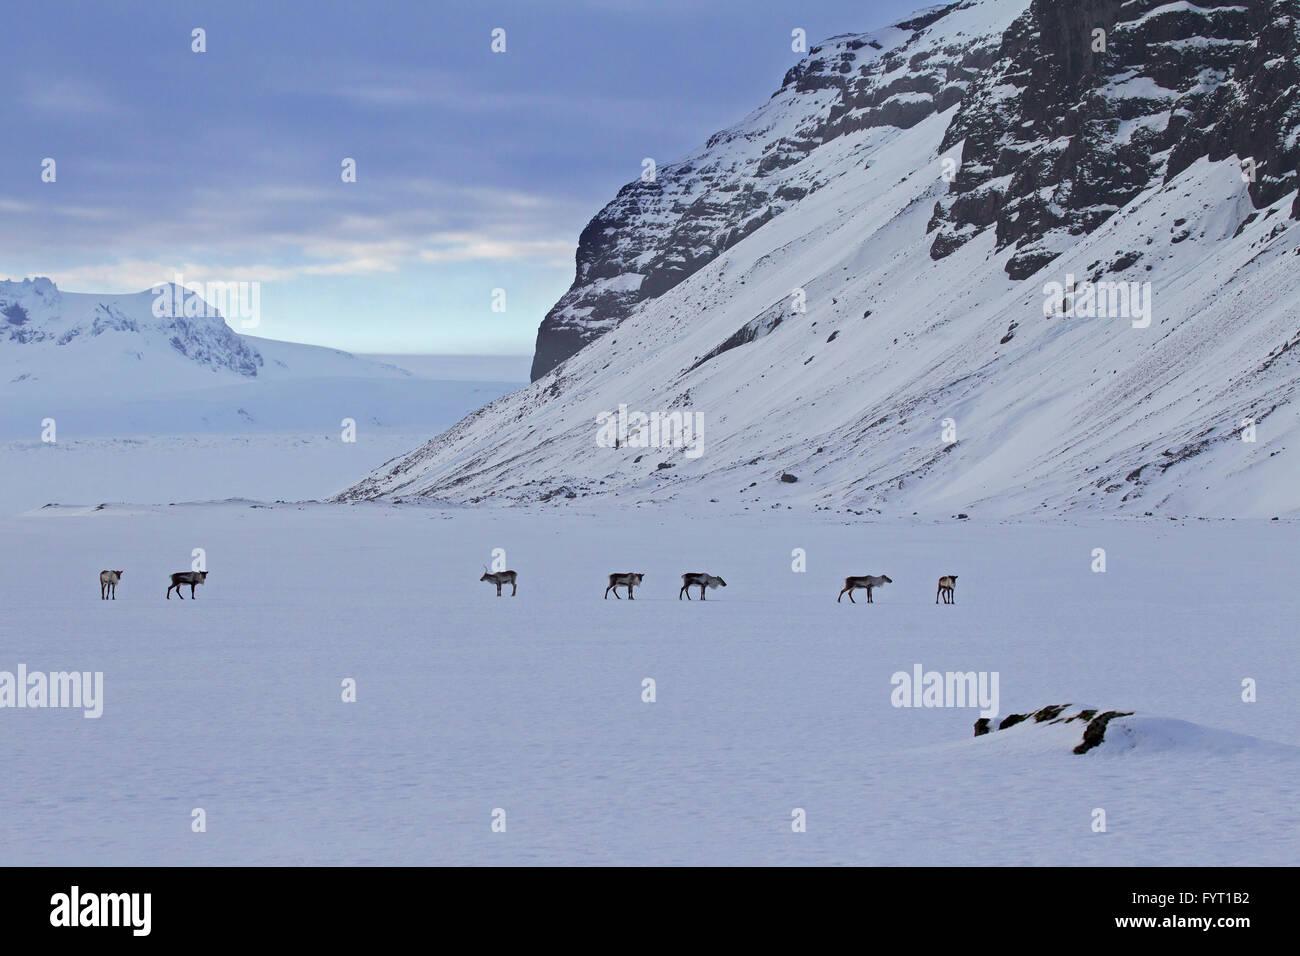 Reindeer (Rangifer tarandus) herd foraging in snow covered winter landscape, Iceland - Stock Image